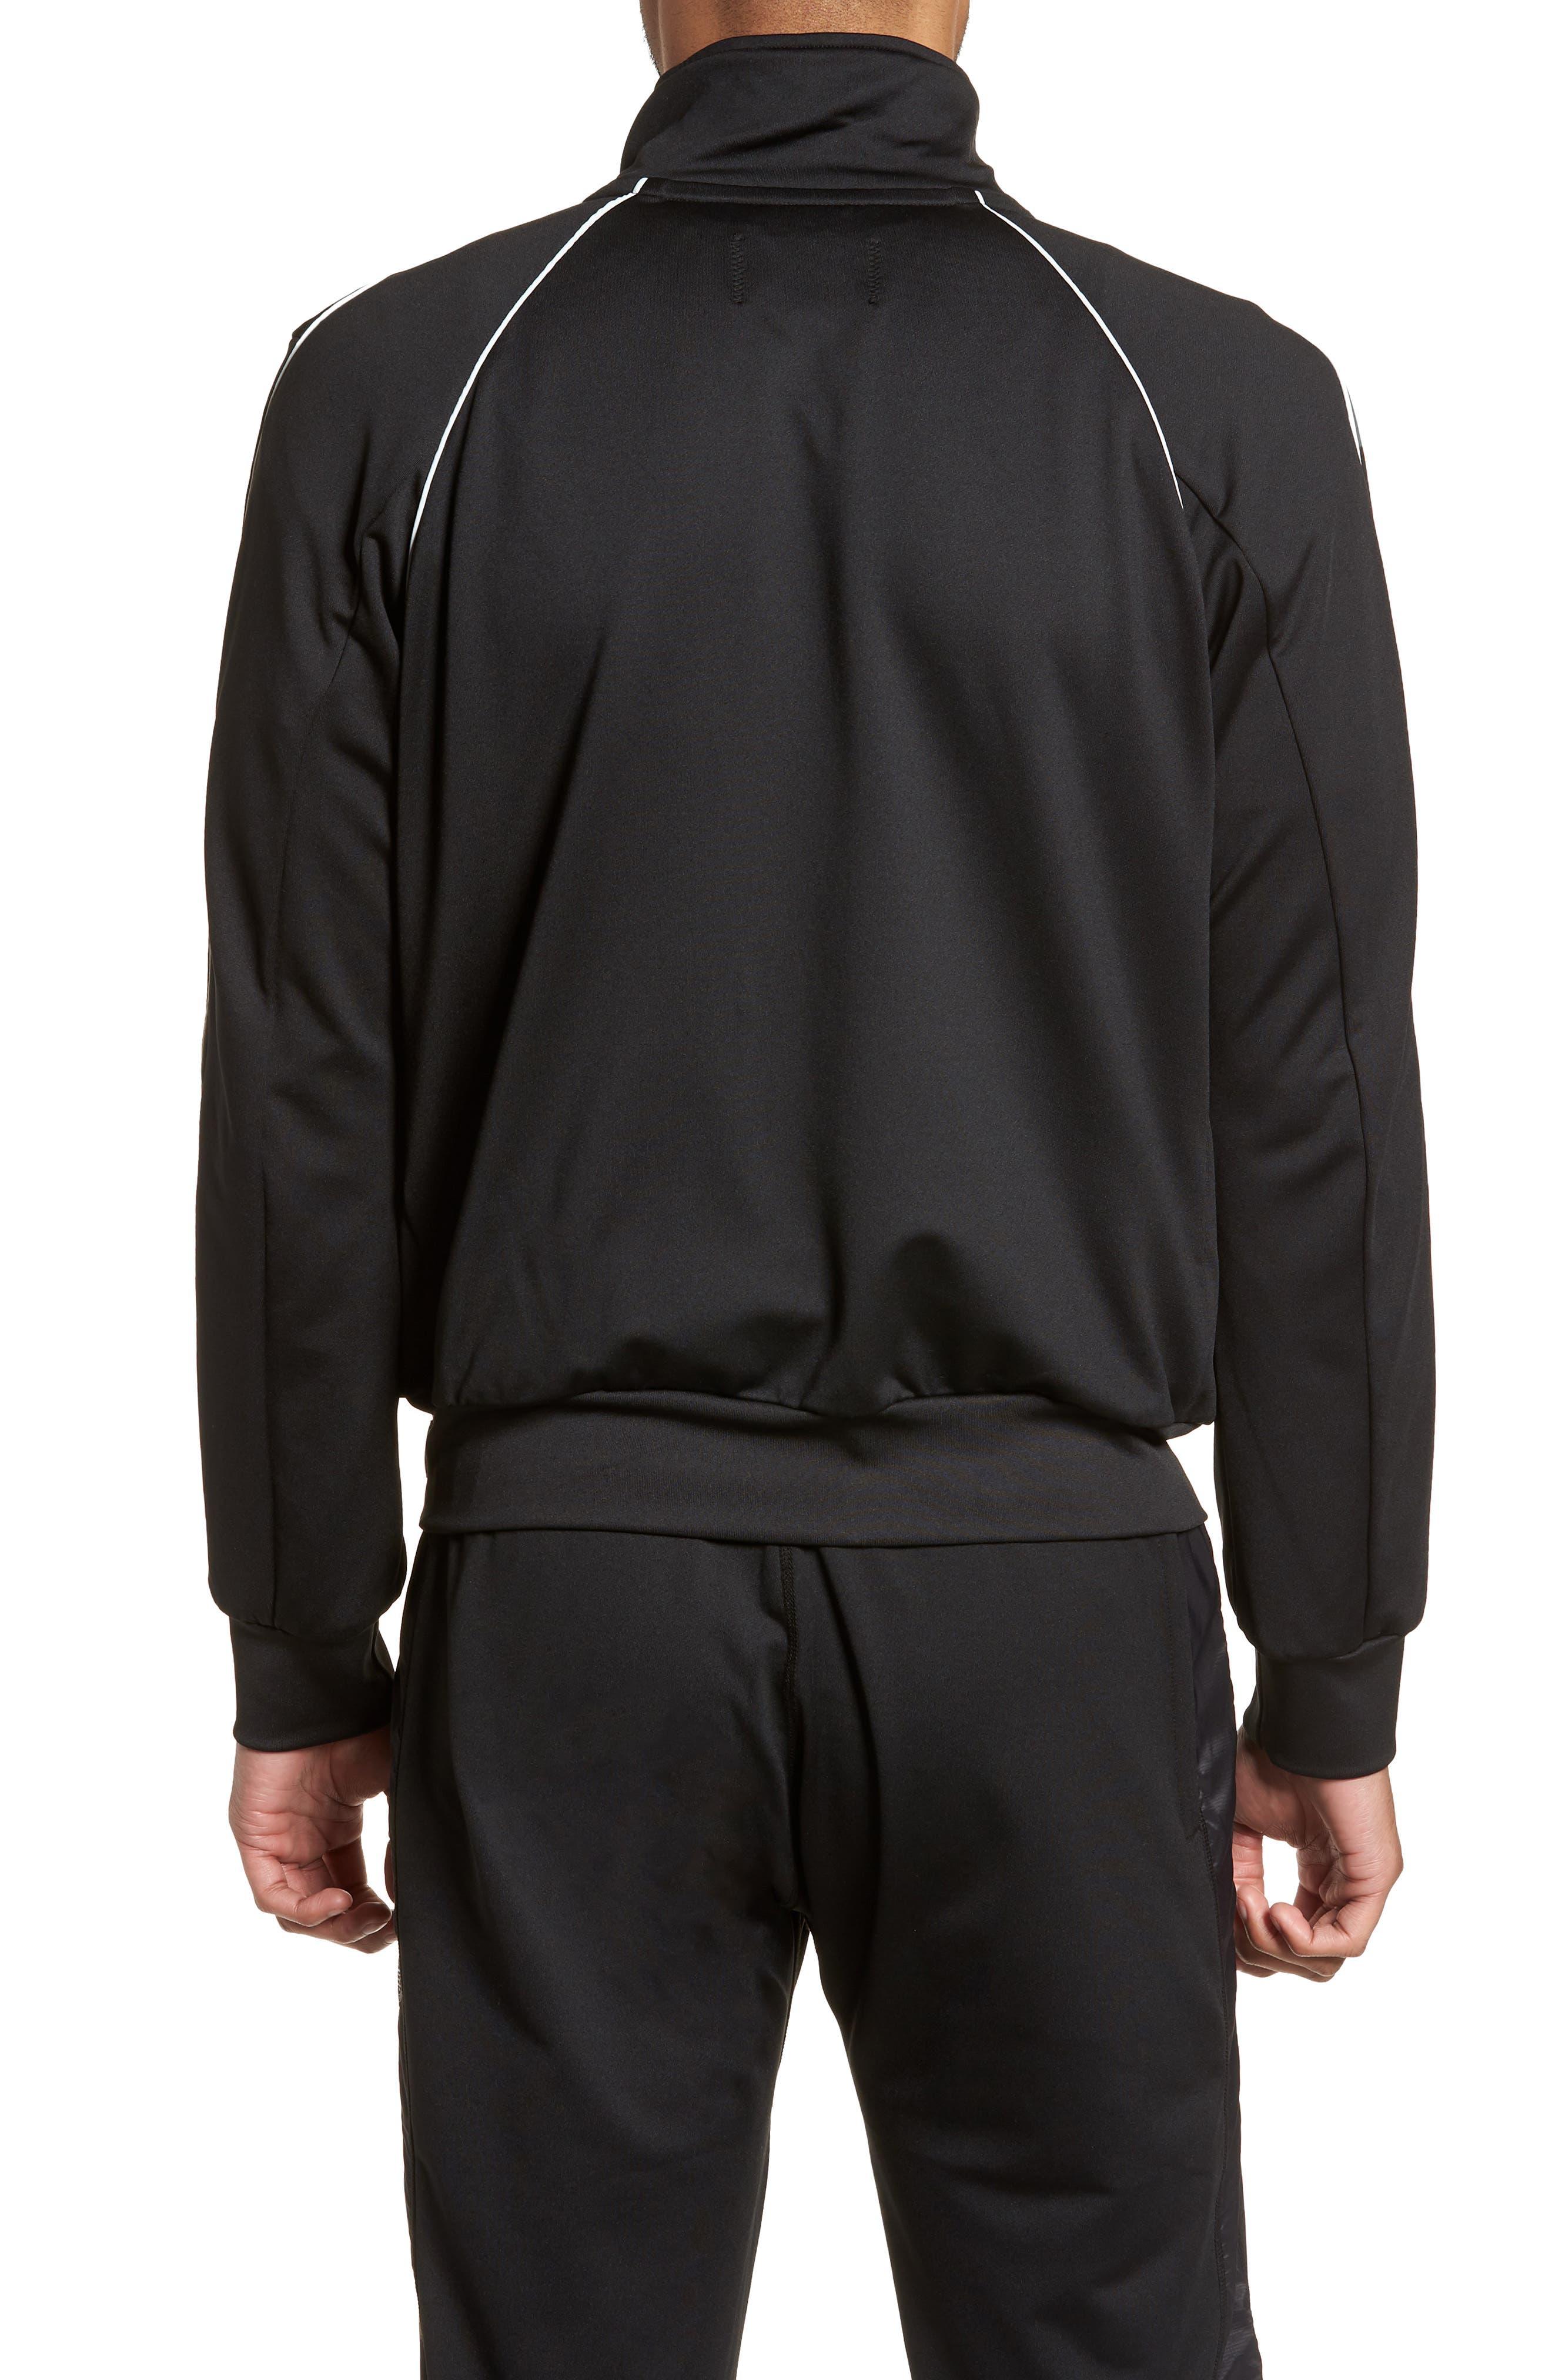 CoolMax<sup>®</sup> Track Jacket,                             Alternate thumbnail 2, color,                             001